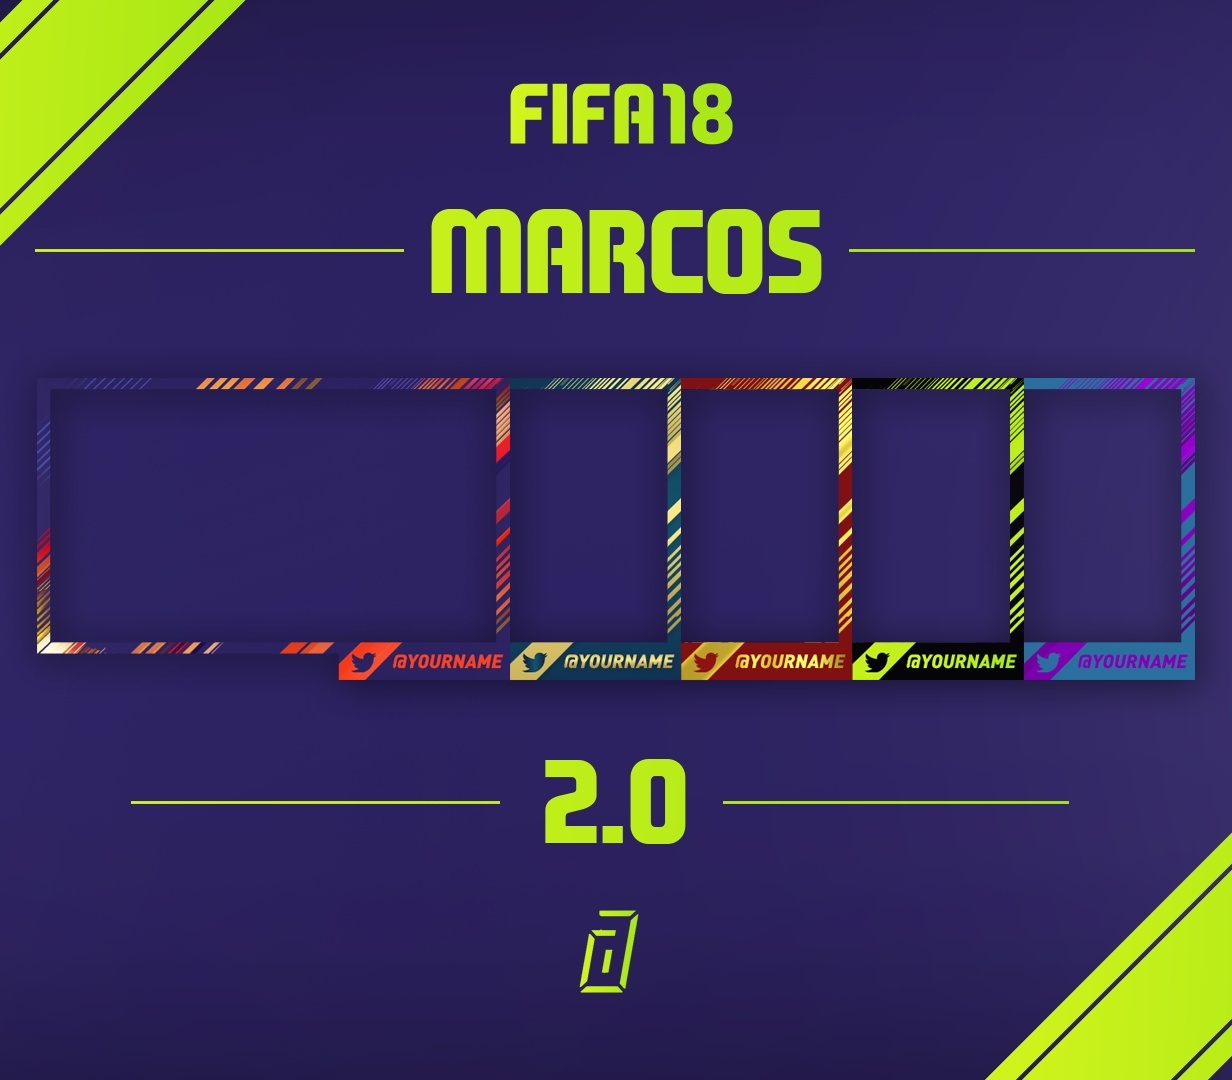 FIFA18   MARCOS 2.0